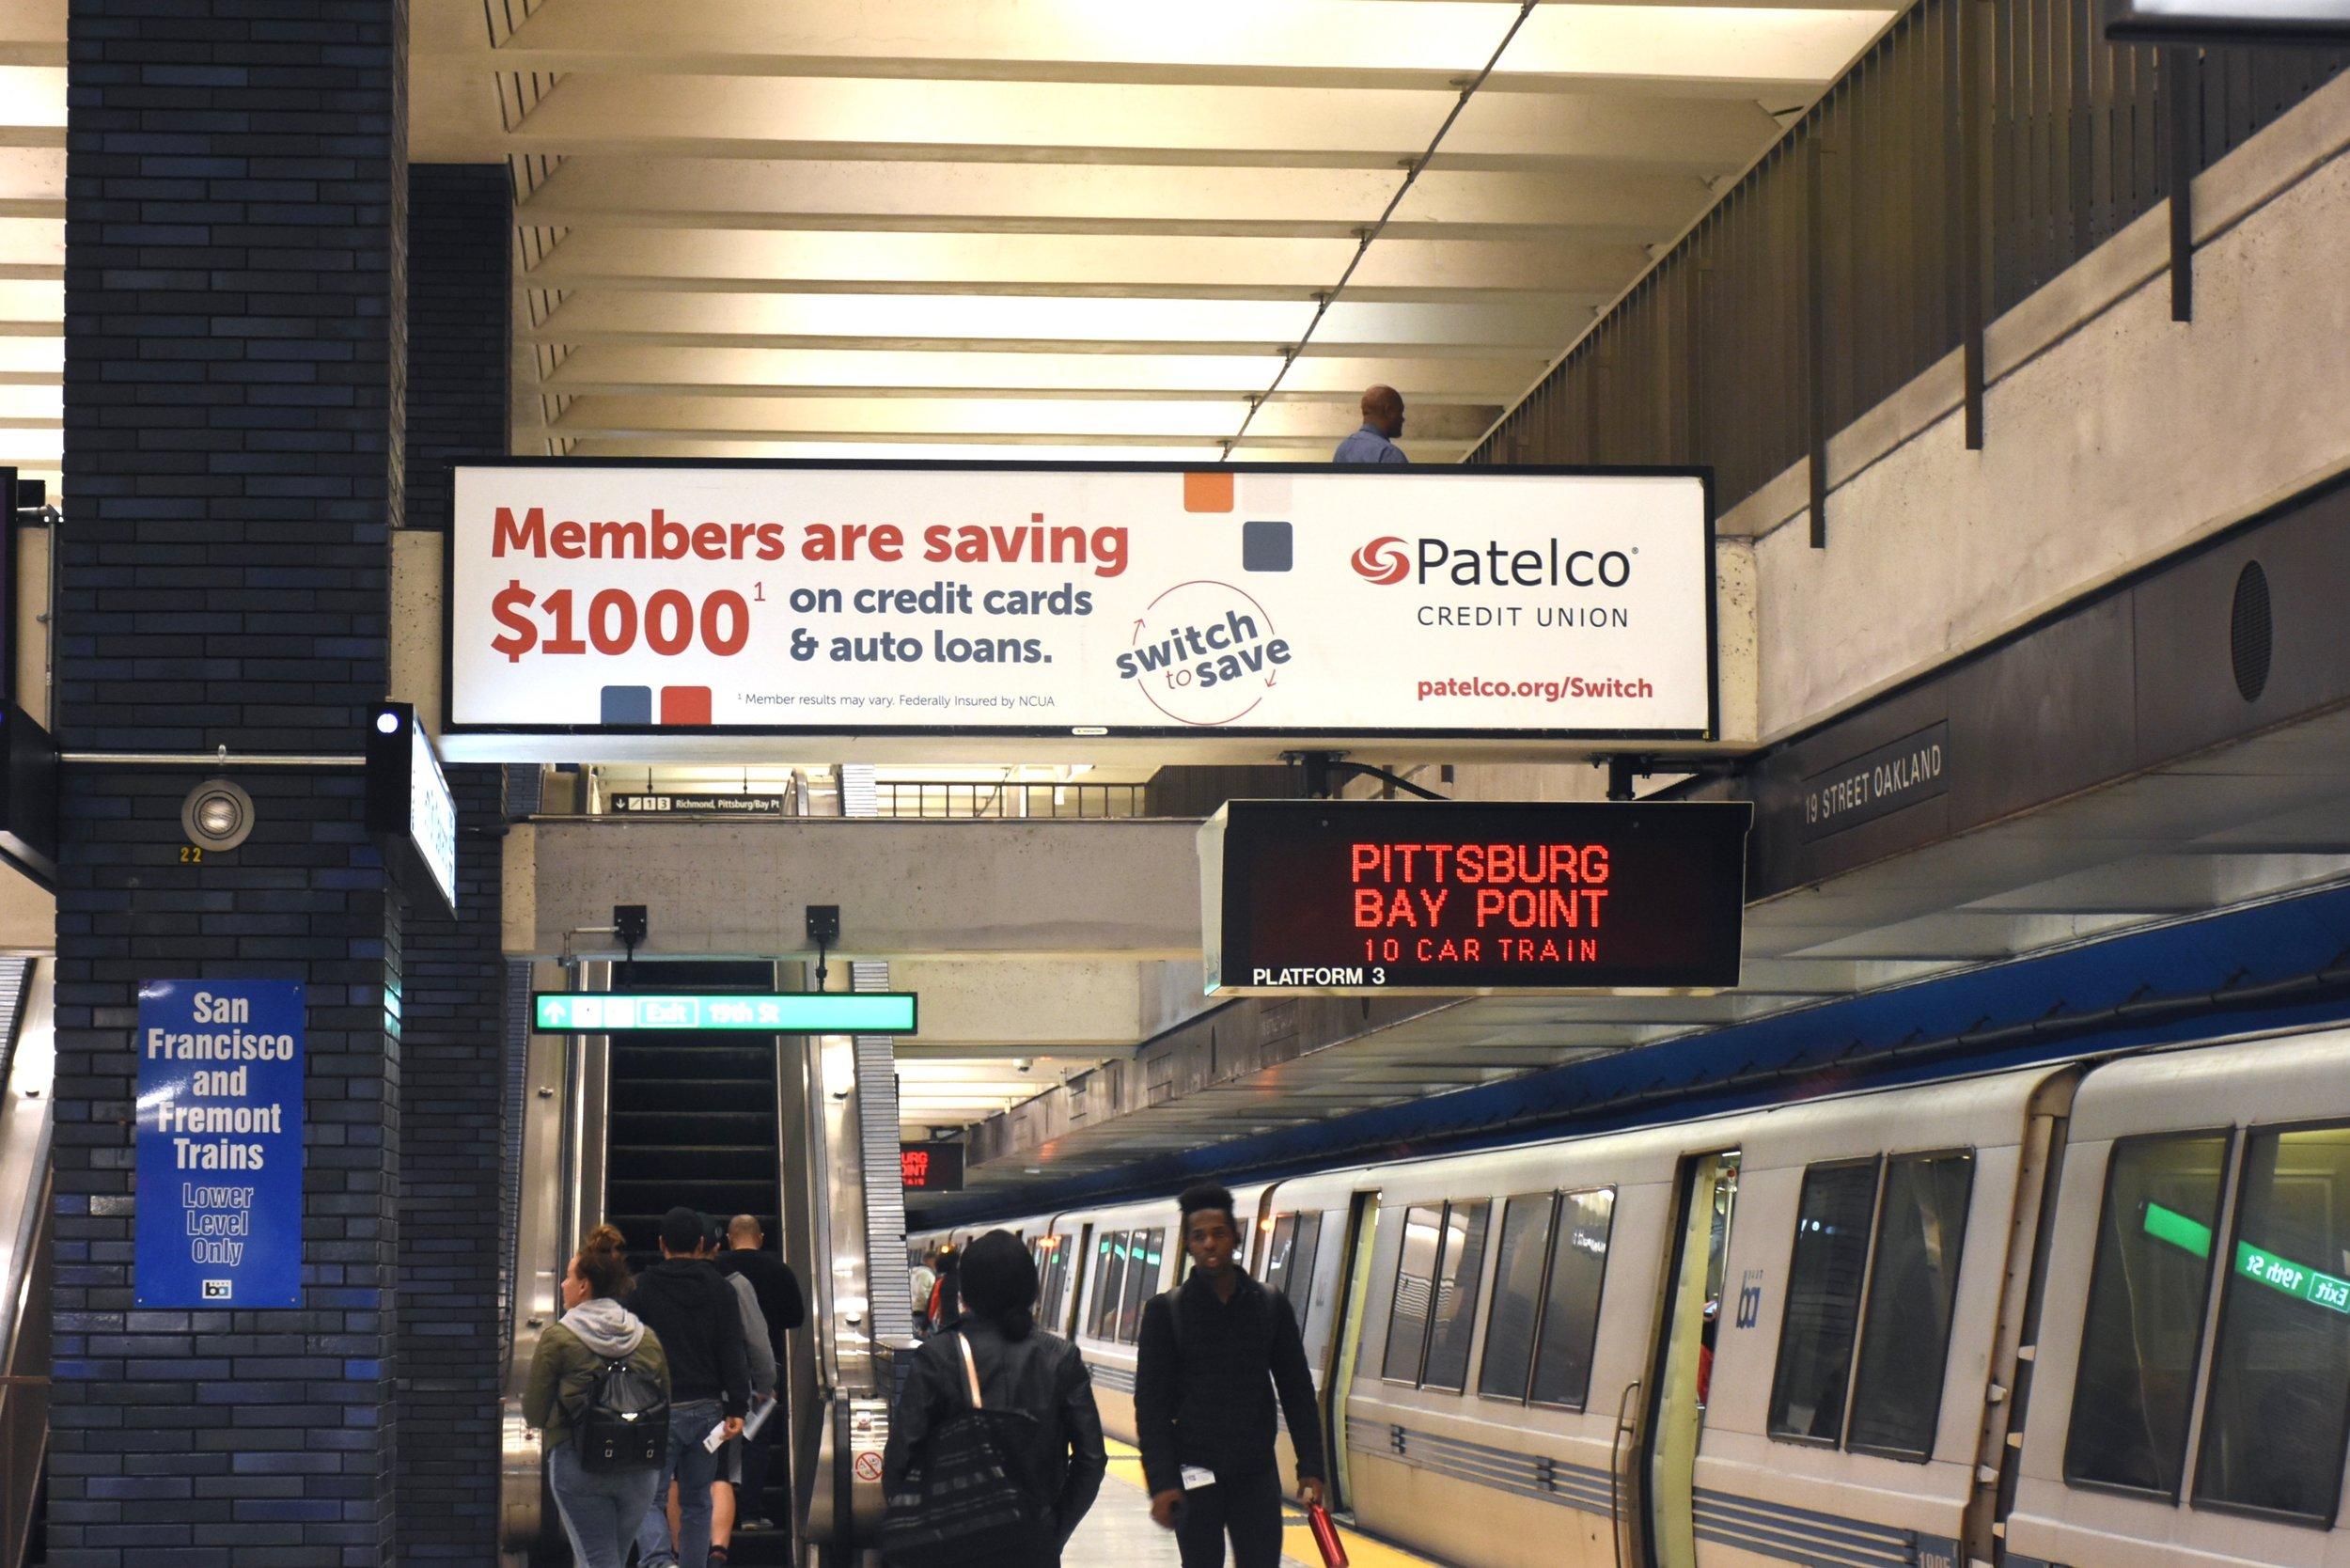 San Francisco_Rail_Rail King (30x144)_21821177_1003293.jpg